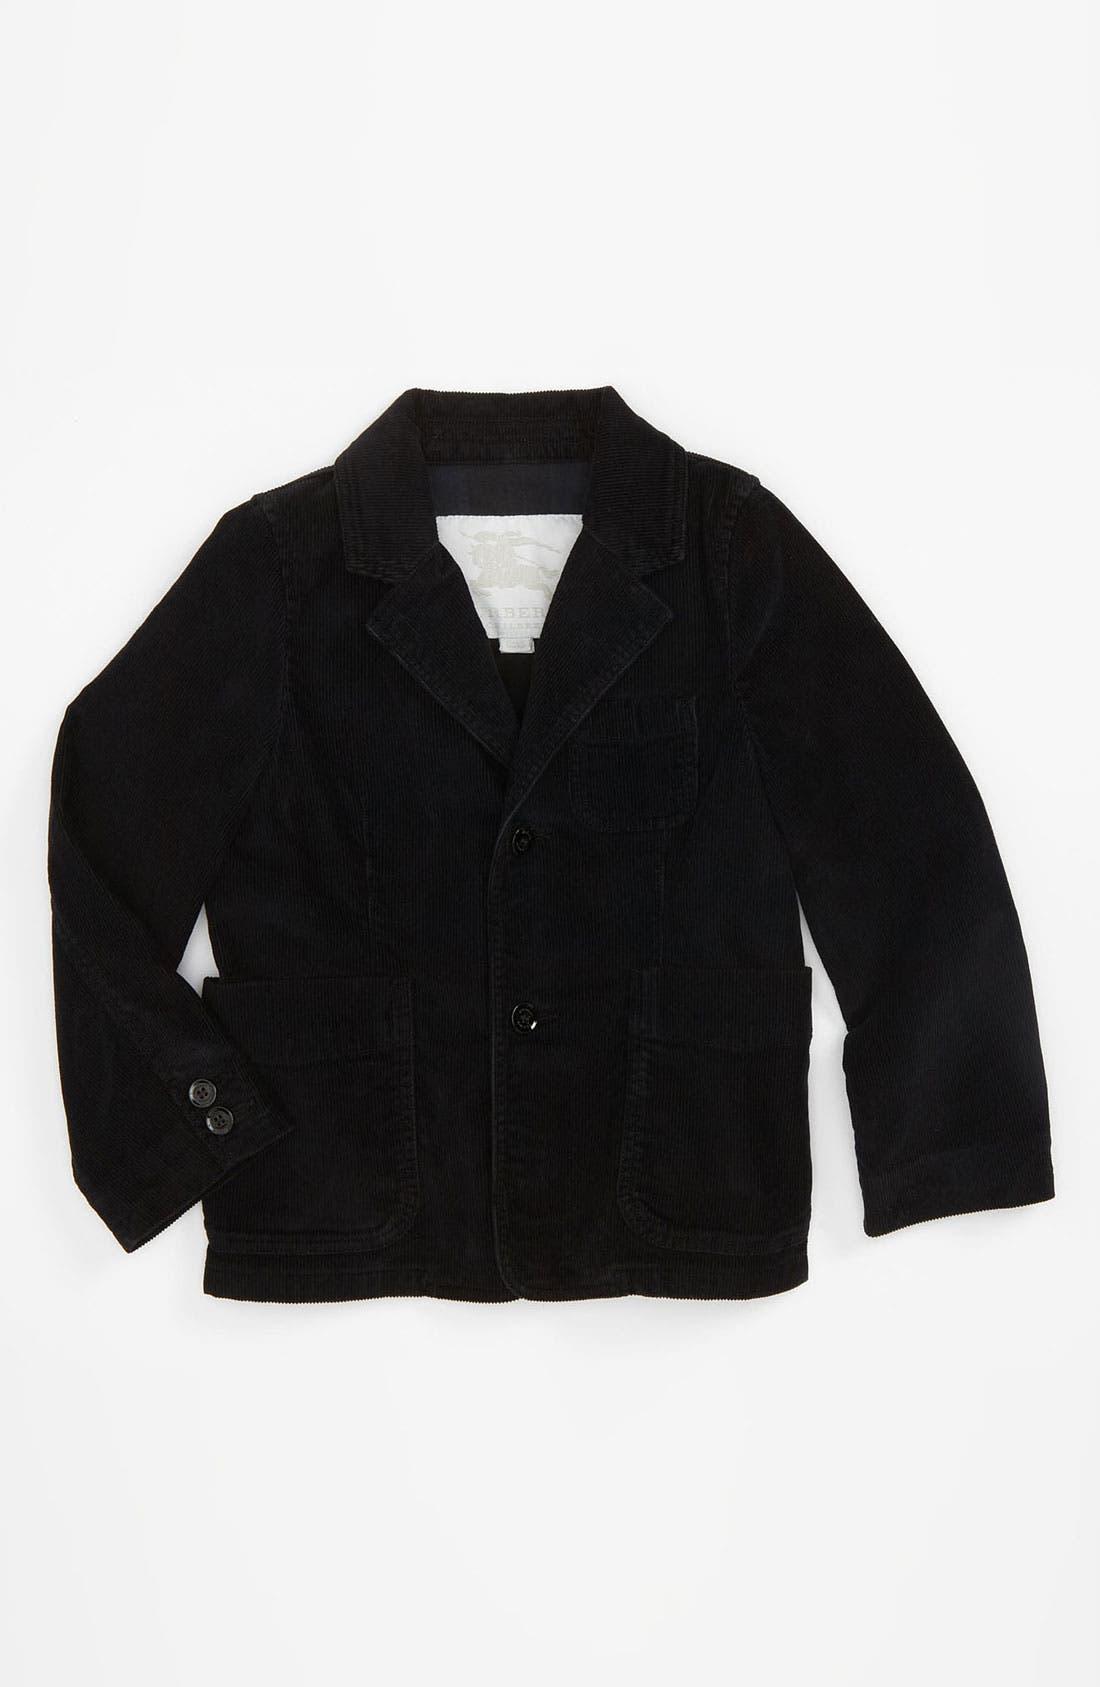 Alternate Image 1 Selected - Burberry Corduroy Jacket (Little Boys)